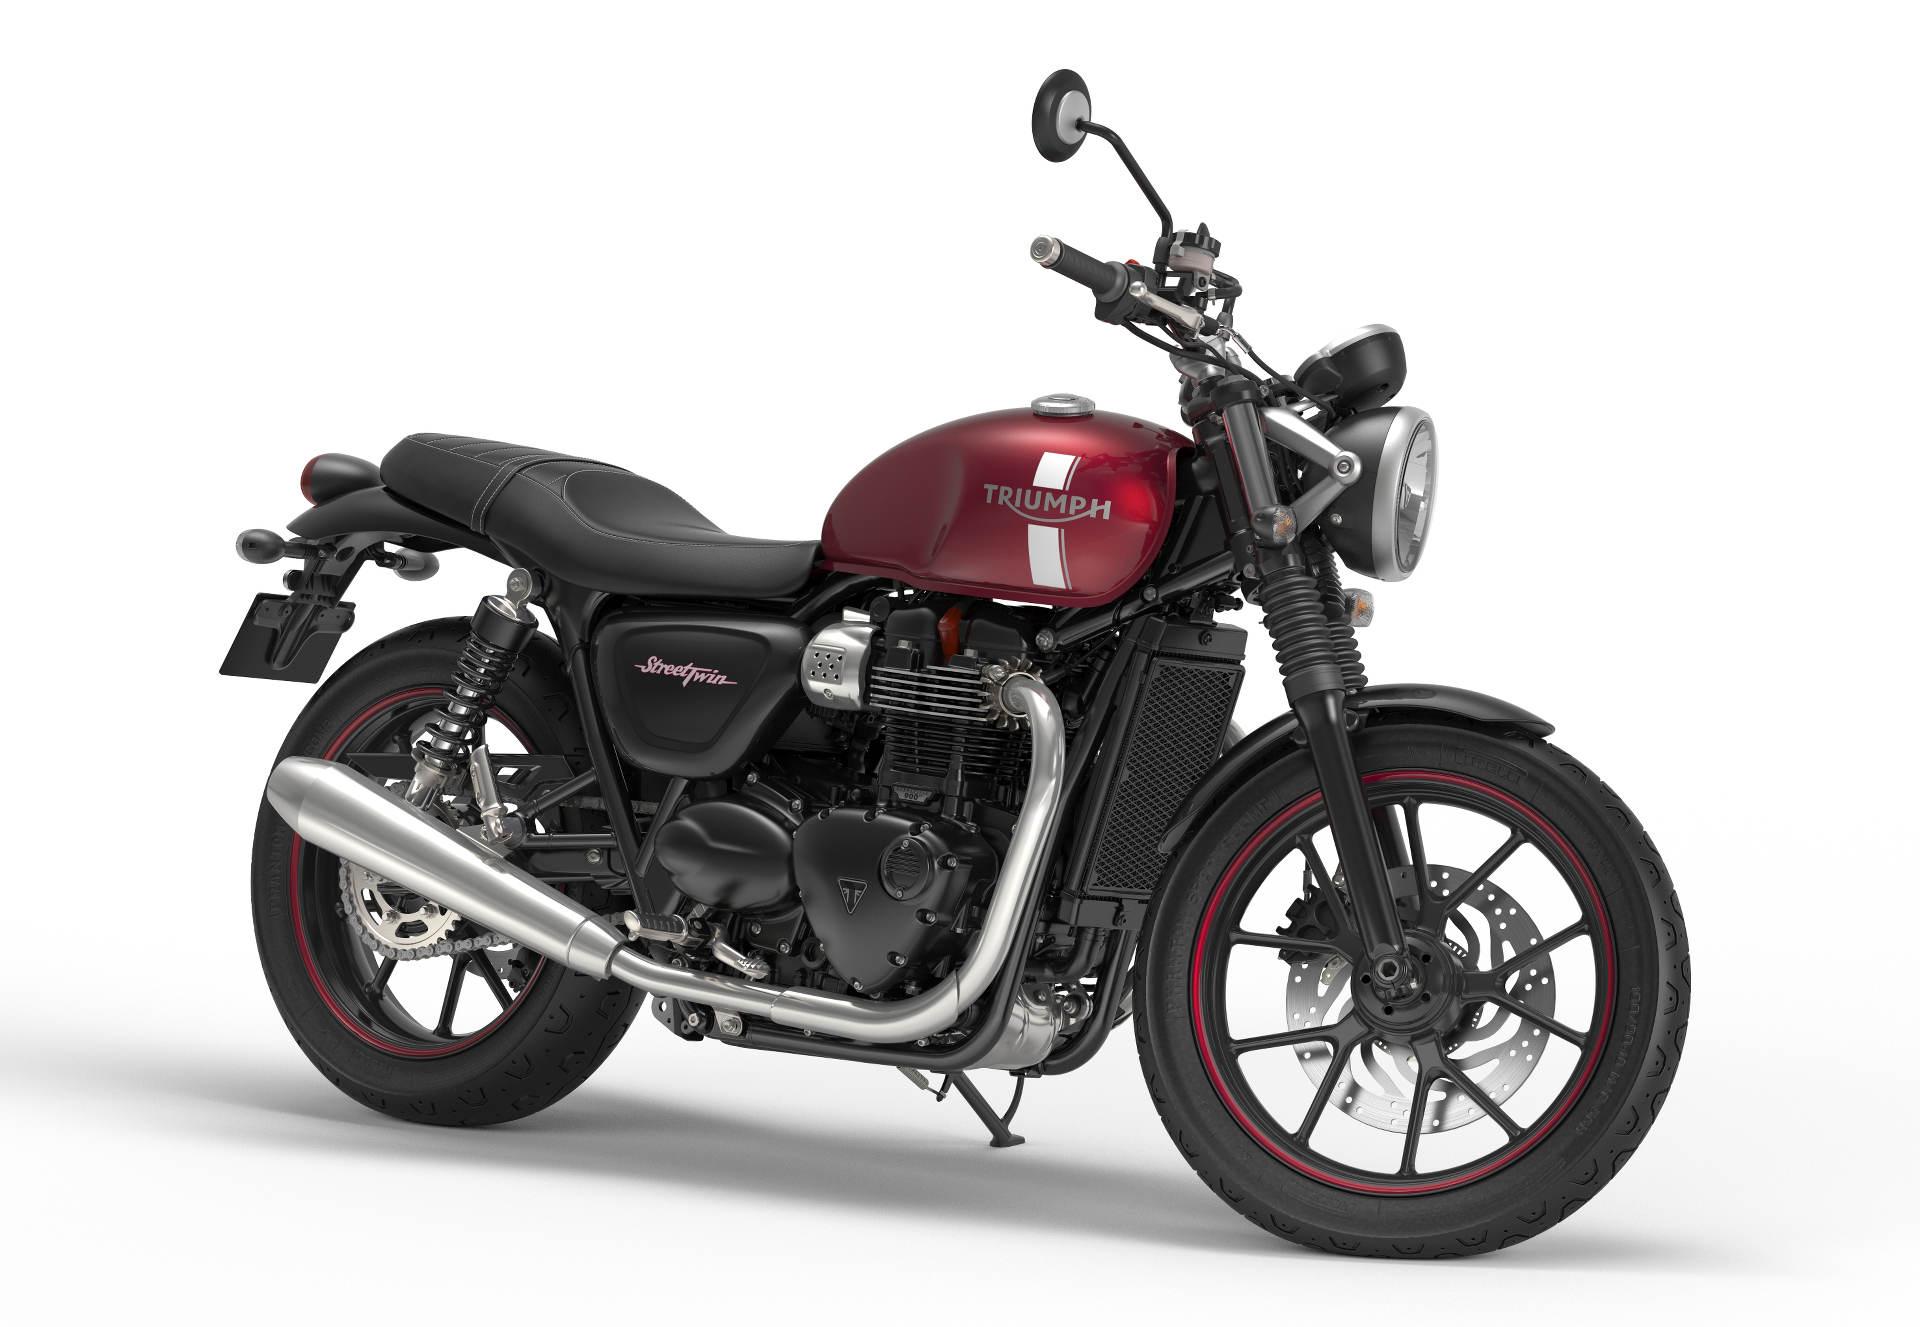 Yamaha Yxz 1000r 2016 further 2018 Kawasaki Ninja 400 45hp 168kg Wet additionally Suzuki Burgman 400 2005 likewise 2014 Honda Vfr 800 F besides Itemid 600084316. on liquid cooled seats